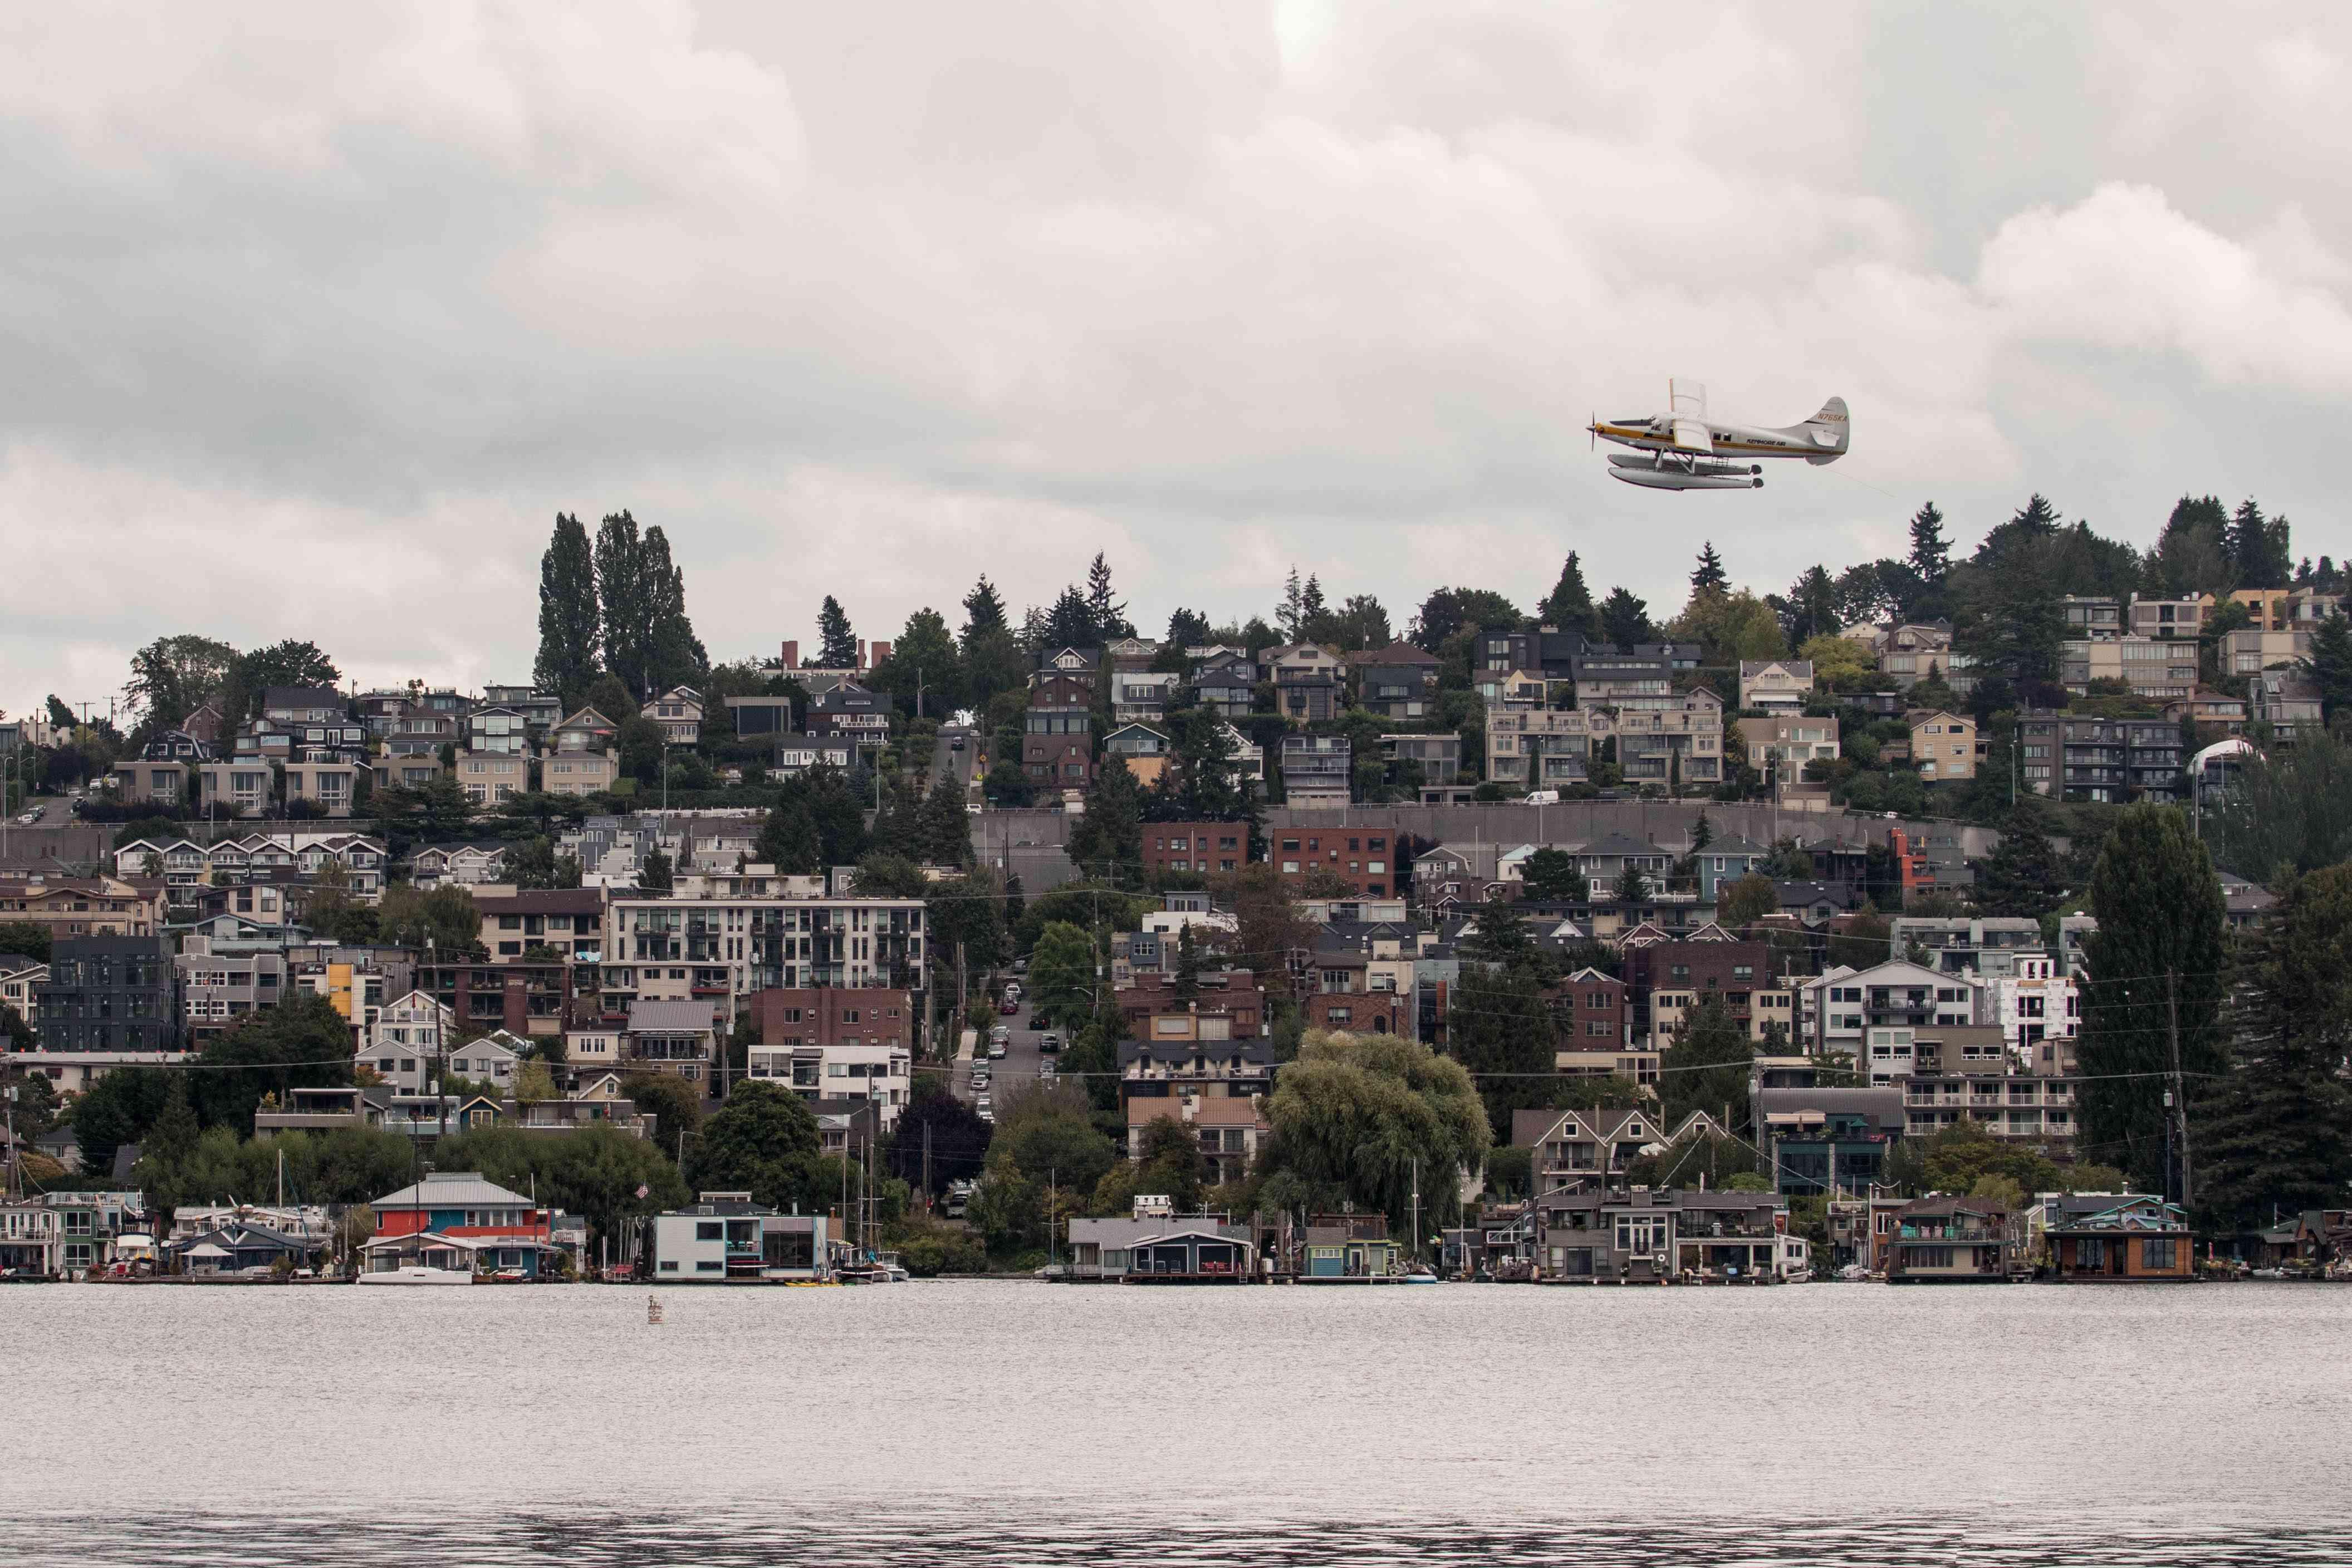 Kenmore Air seaplanes in Seattle, Washington